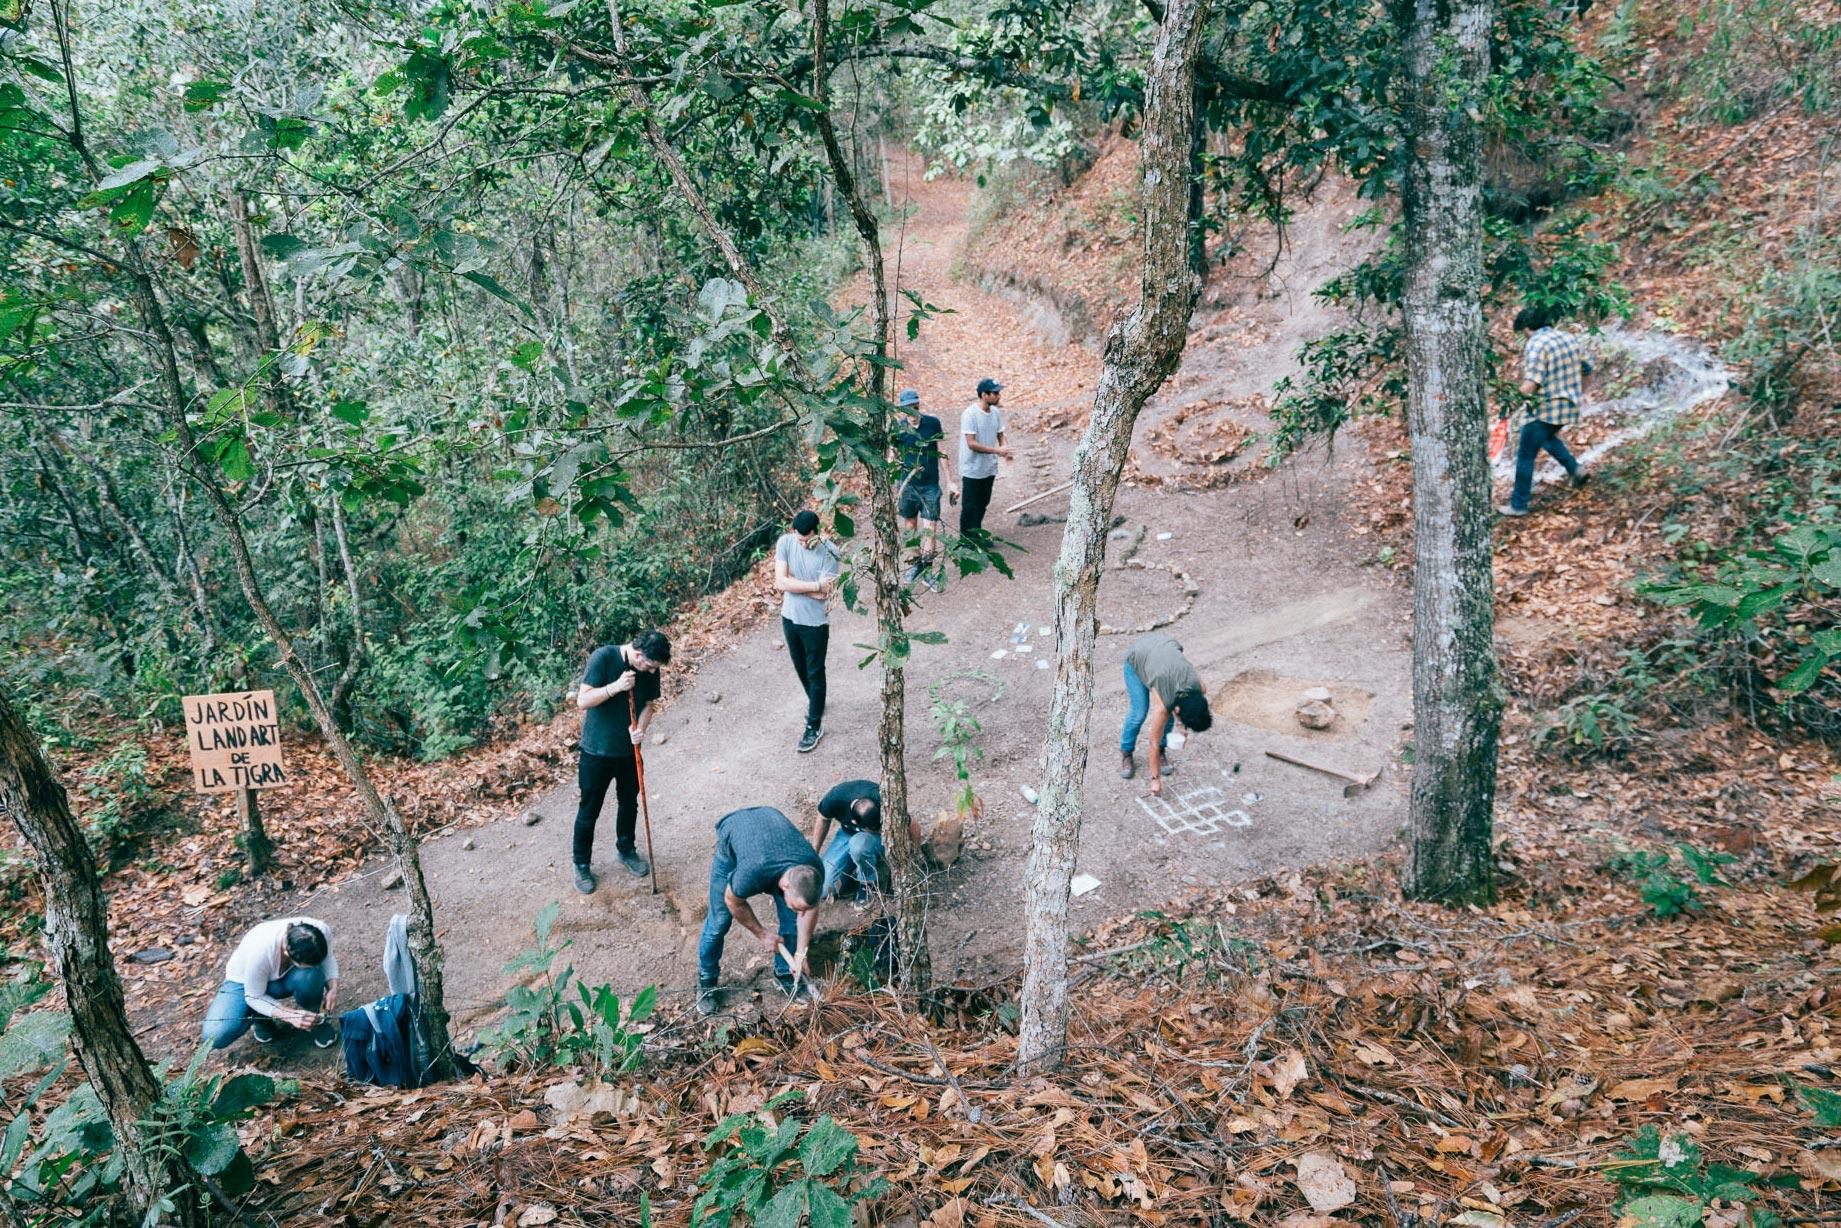 Thomas Geiger, Jardin Land Art de La Tigra (La Tigra Land Art Garten), Public Project, Réunion - La Tigra Forest, Tegucigalpa, Honduras, 2018